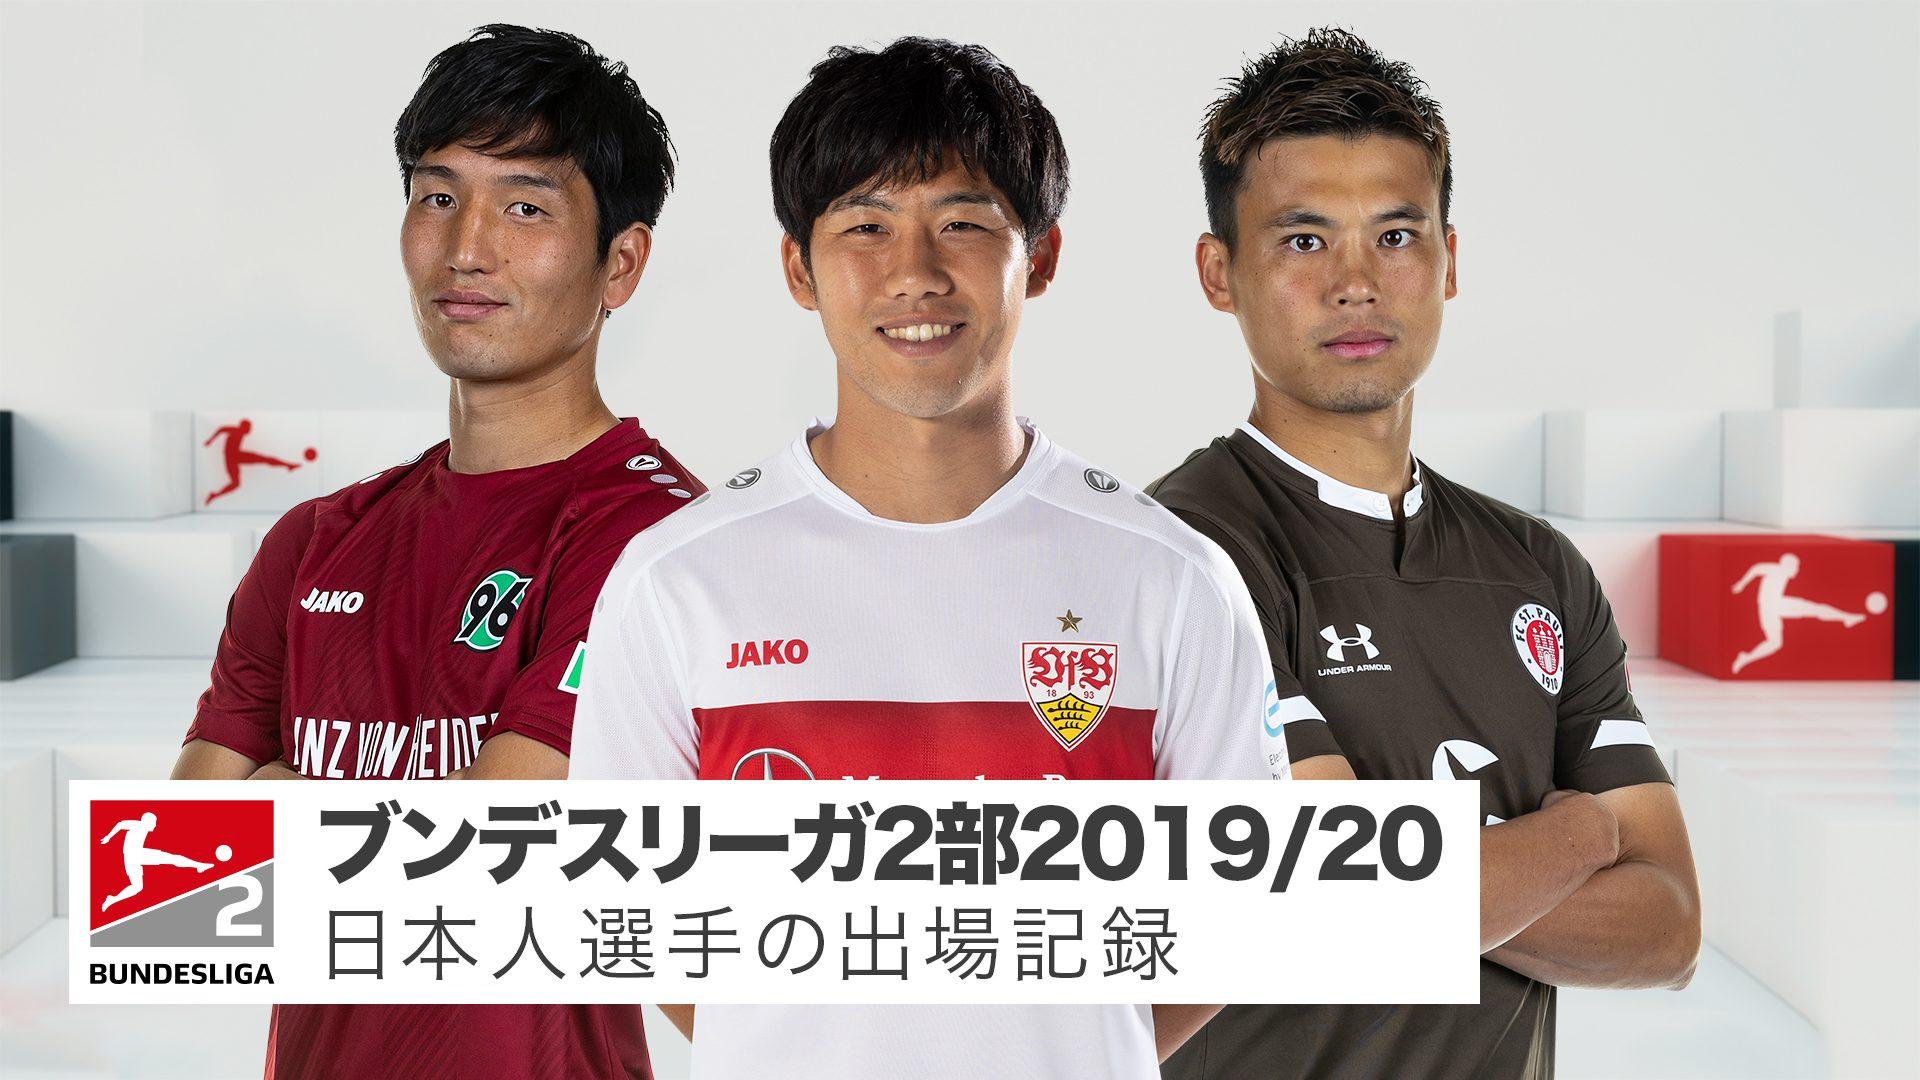 日本人選手 2部2019/20シーズン出場記録